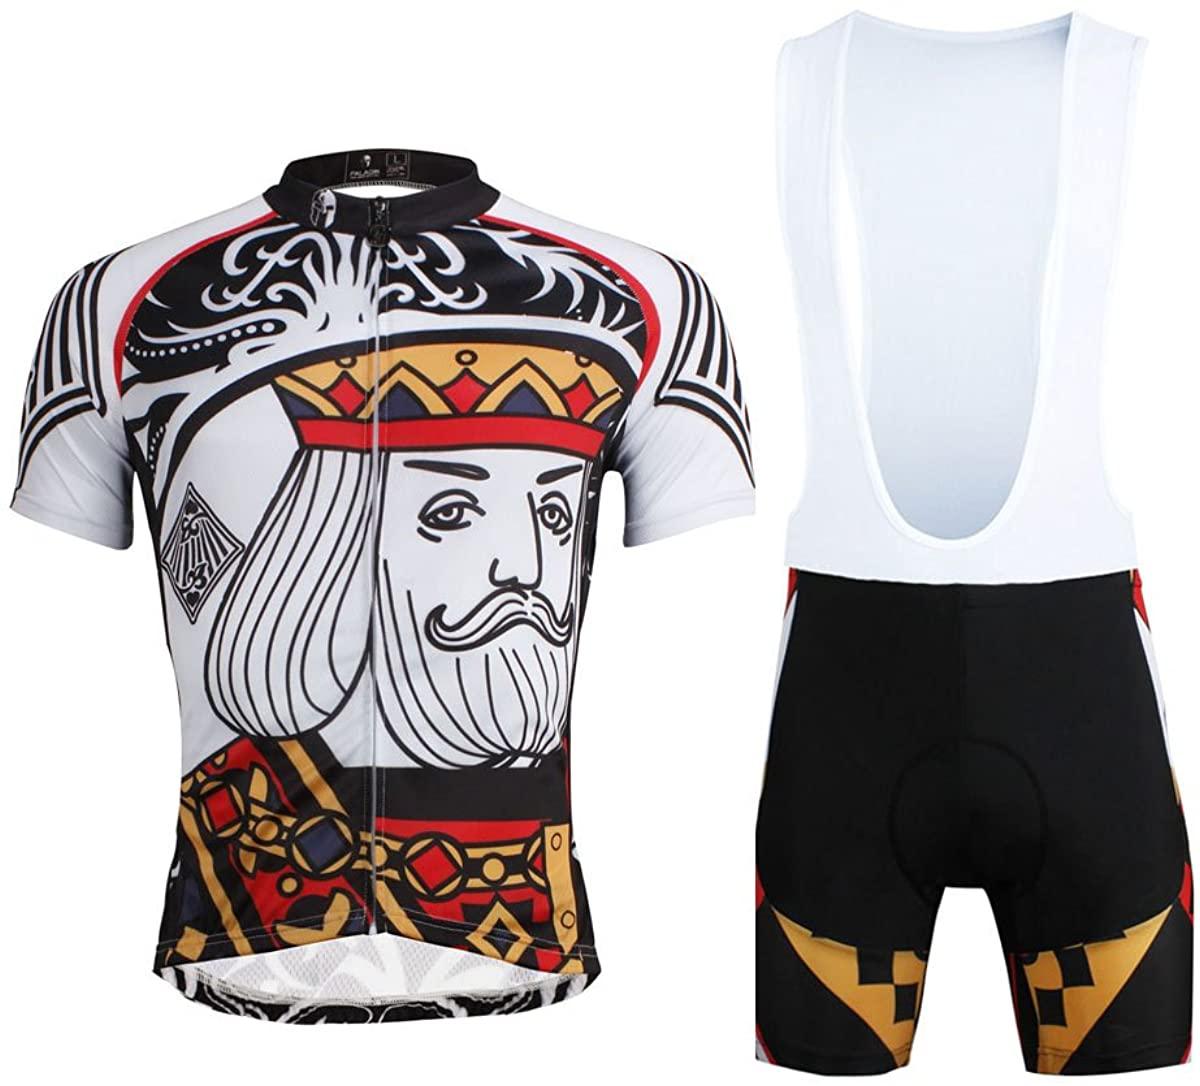 LAOYOU Poker Pattern - Diamond Mens Cycling Jersey Size S To 6XL